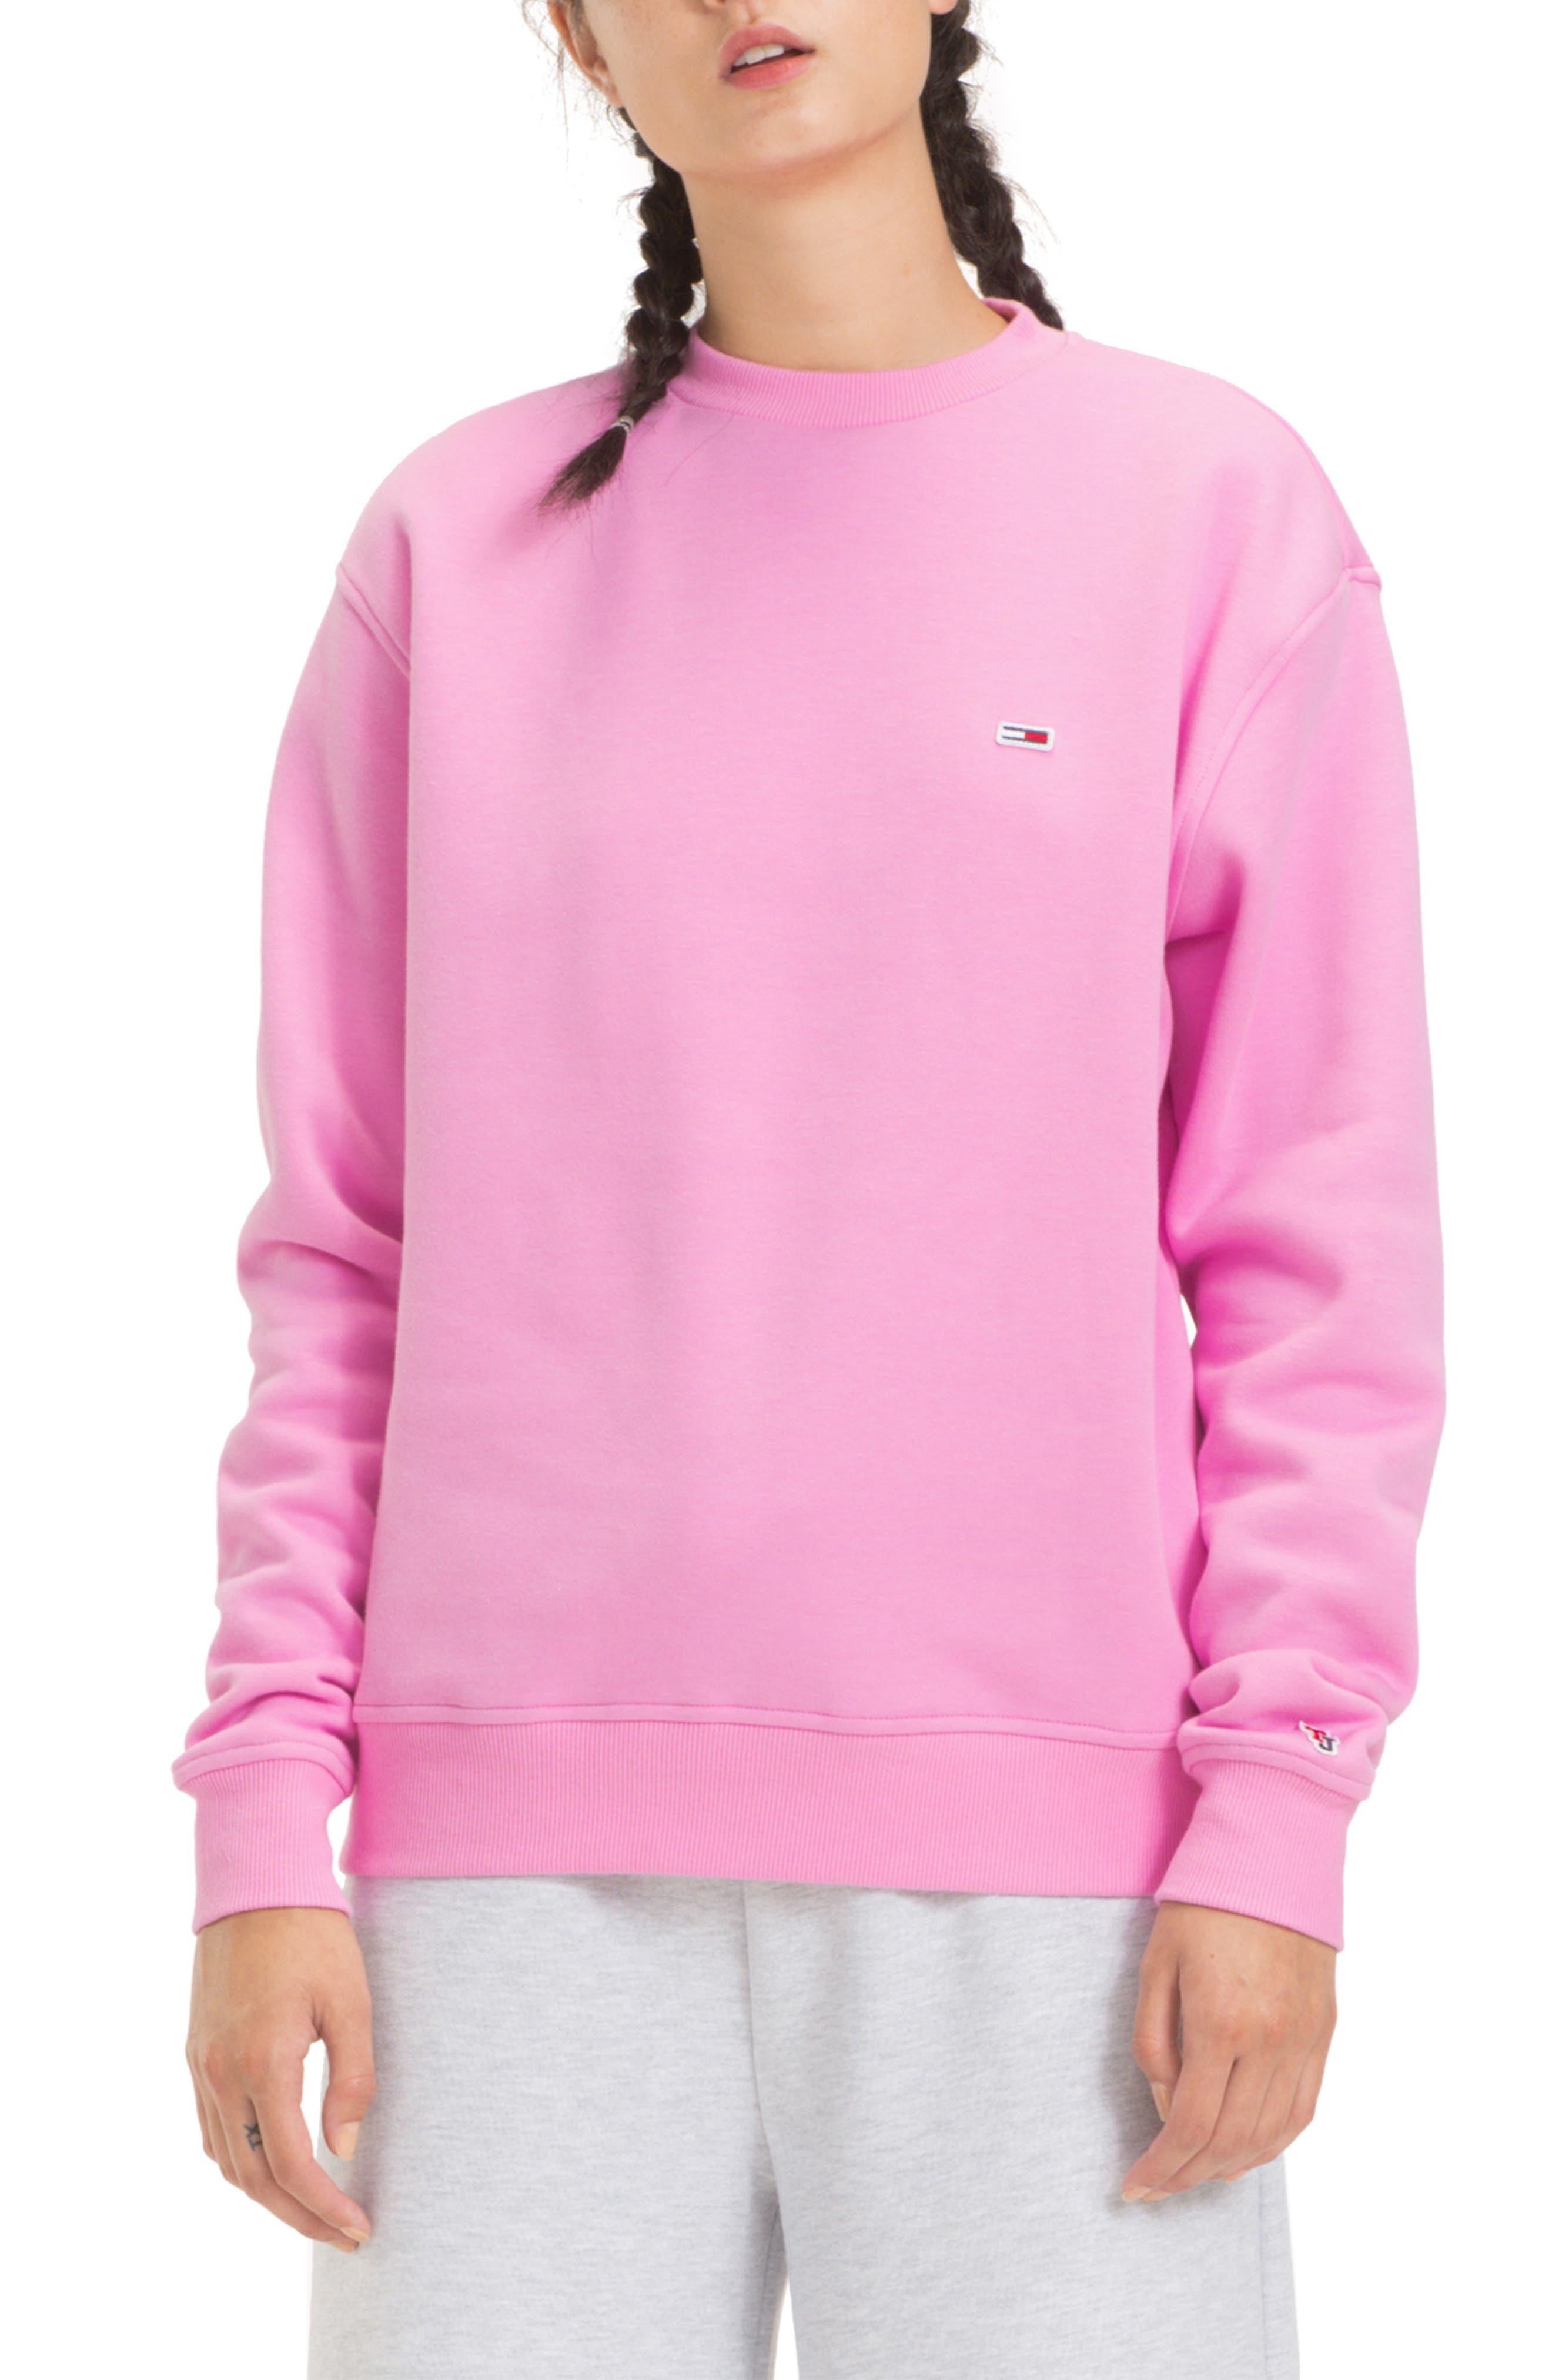 TOMMY JEANS TJW Tommy Classics Sweatshirt, Main, color, LILAC CHIFFON